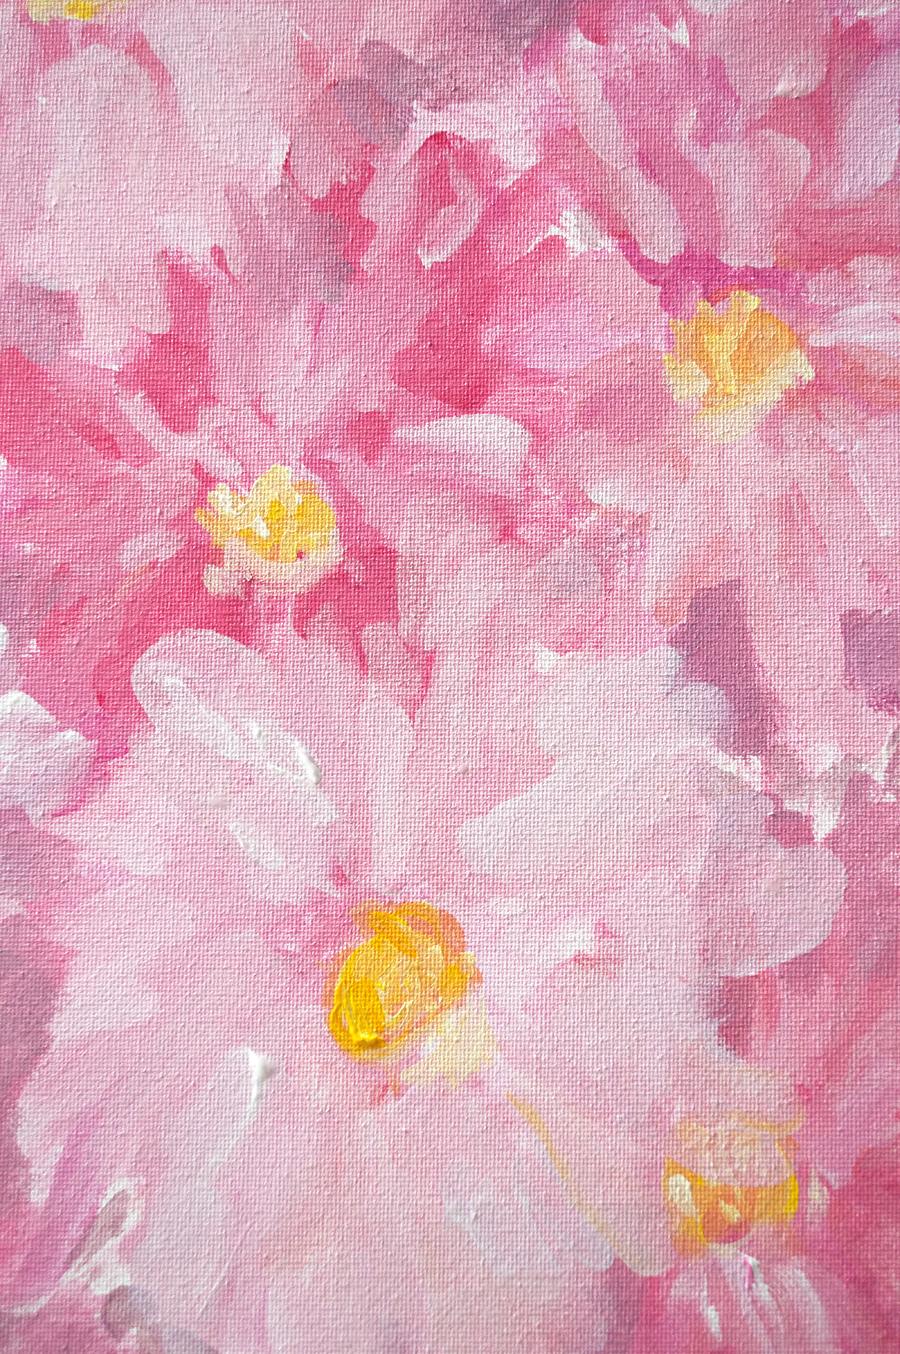 Dahlia Painting by Kristen Laczi